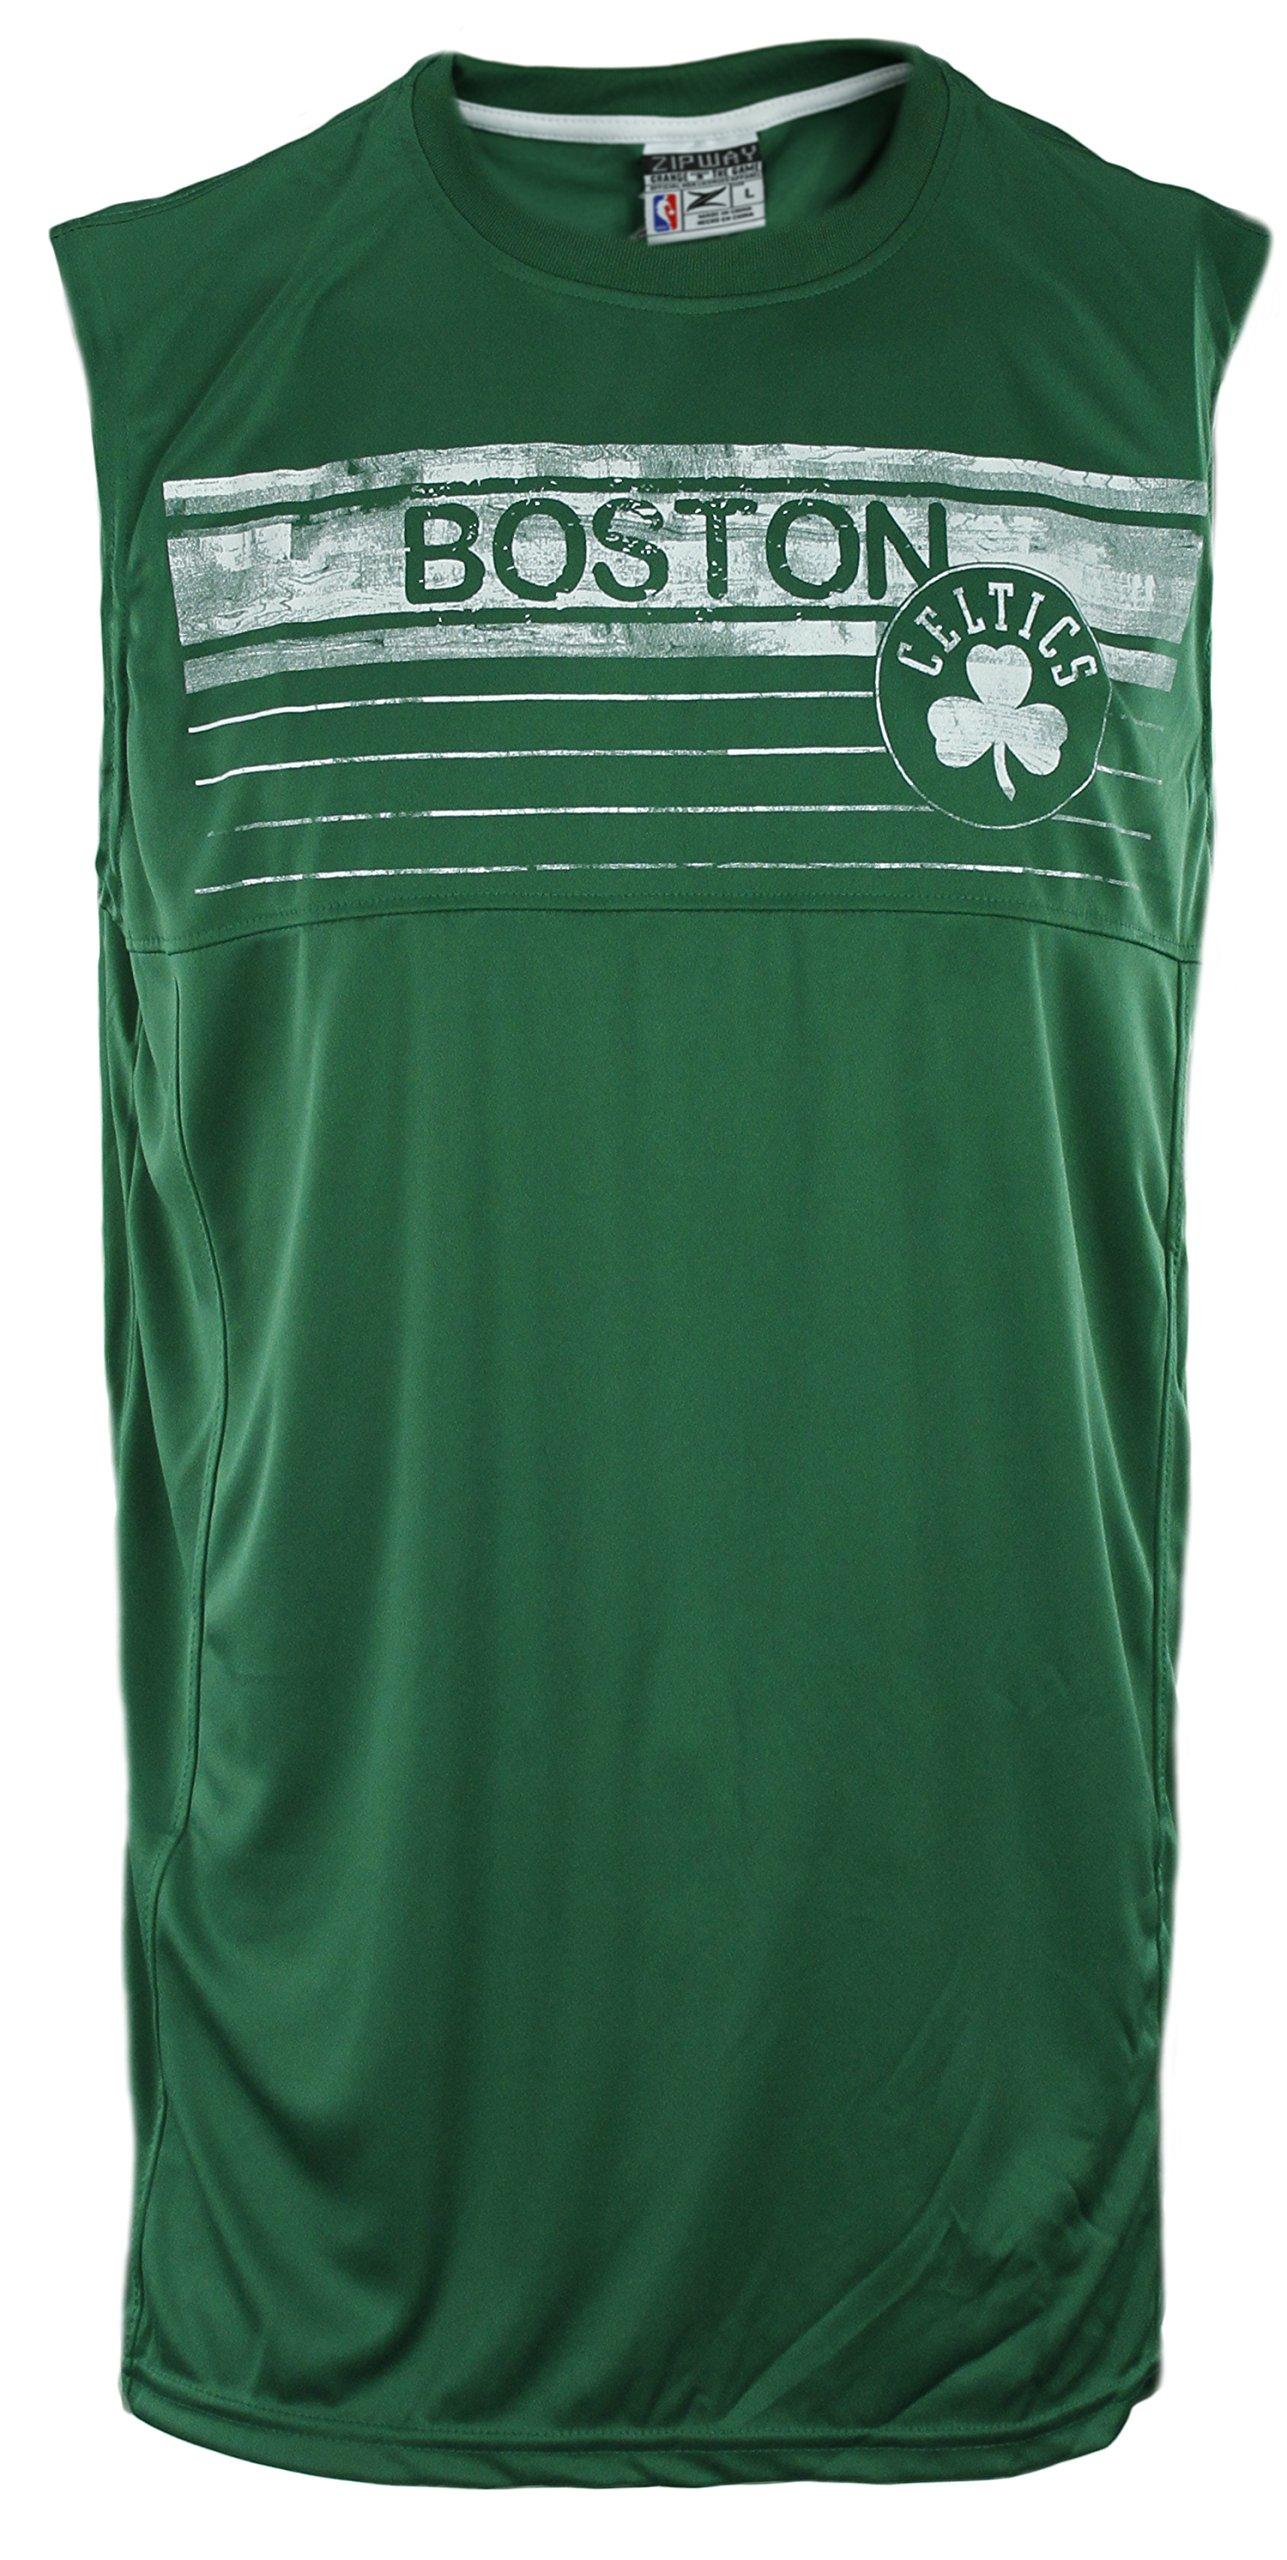 643a8a36 Zipway Boston Celtics NBA Big Mens Muscle Shirt, Green - Boston Fanz